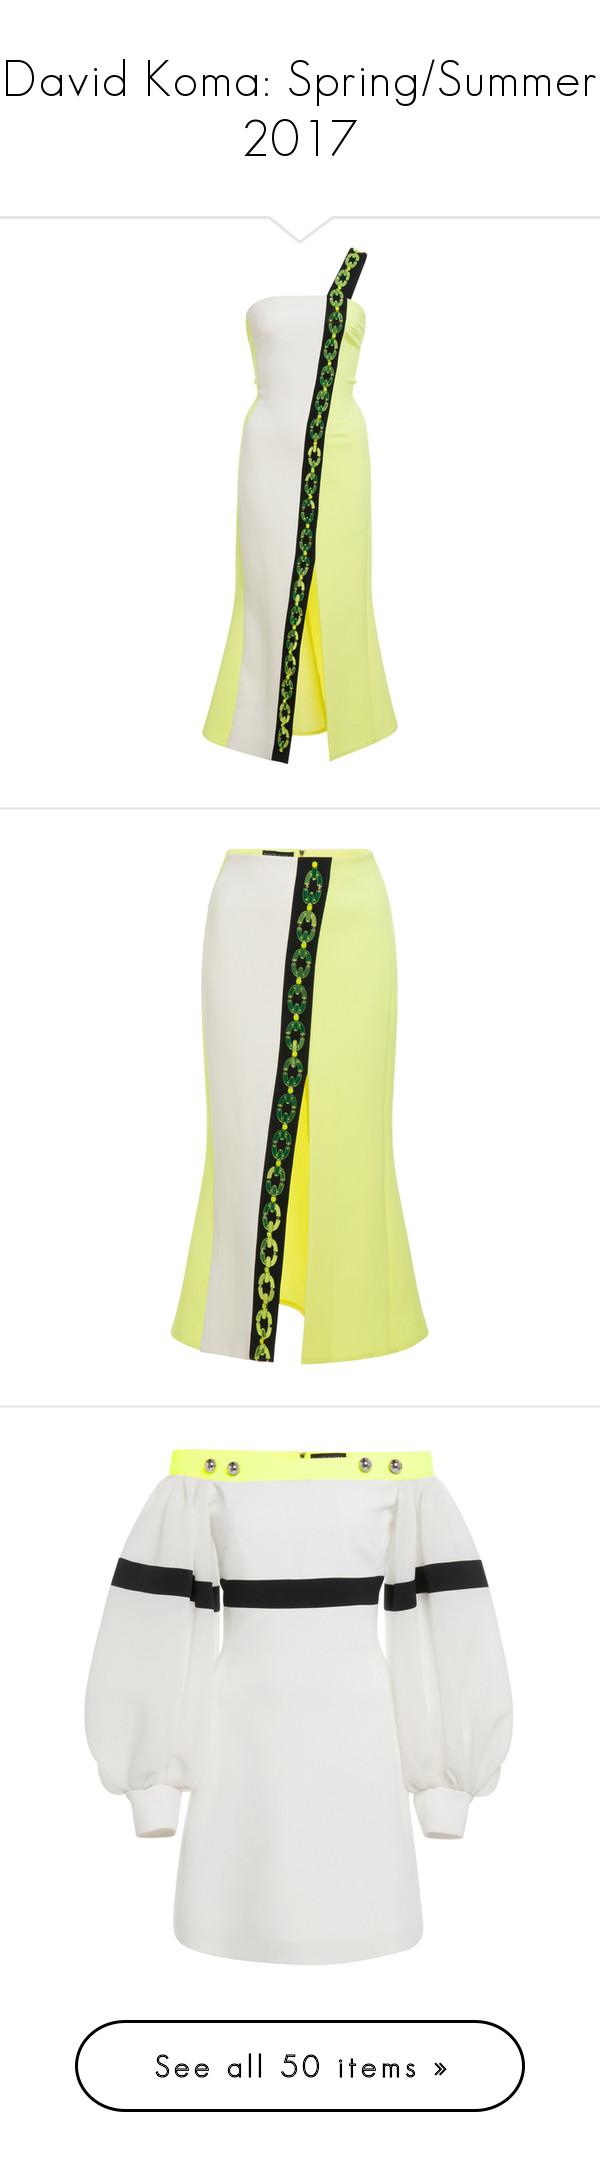 """David Koma: Spring/Summer 2017"" by livnd ❤ liked on Polyvore featuring davidkoma, springsummer2017, livndfashion, livnddavidkoma, dresses, david koma, yellow, white midi dress, yellow dress and strappy dress"